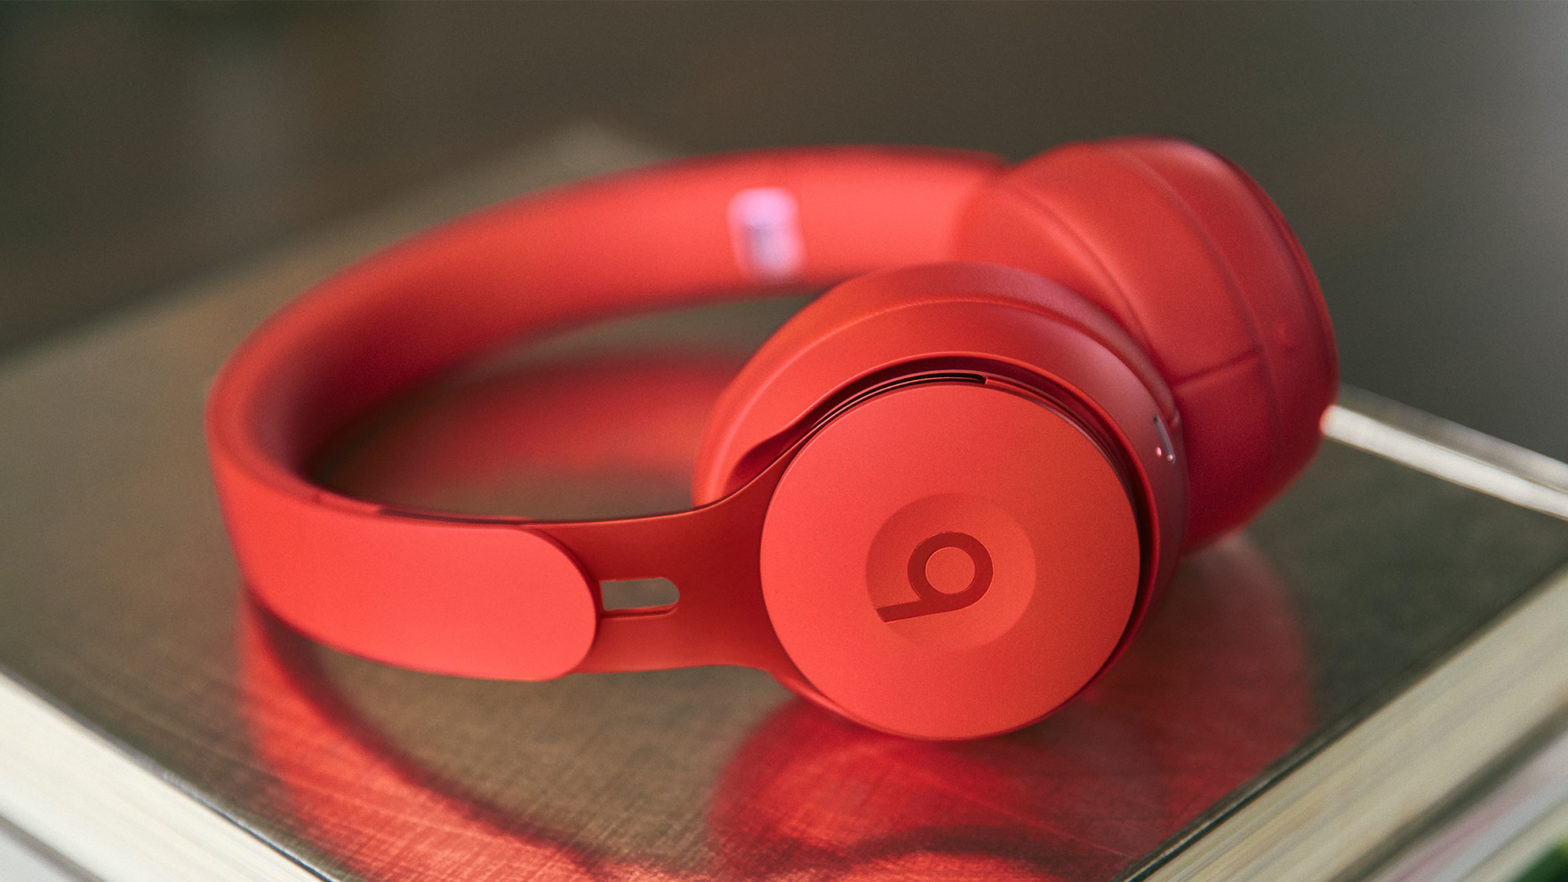 Beats Solo Pro ANC Headphones